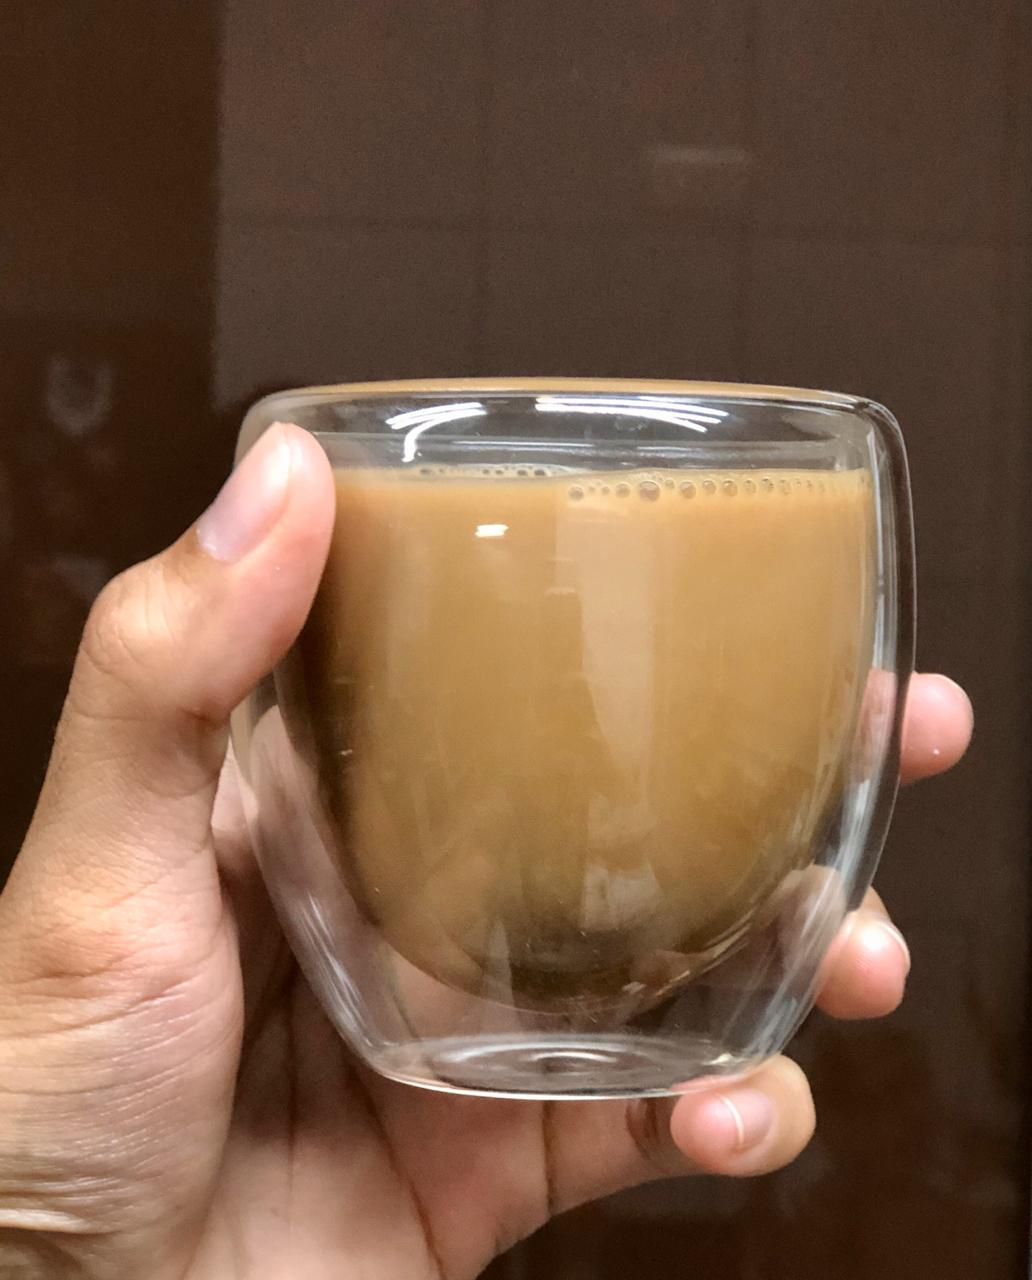 Xícaras de café 2 unidades parede dupla camada de vidro 240mL